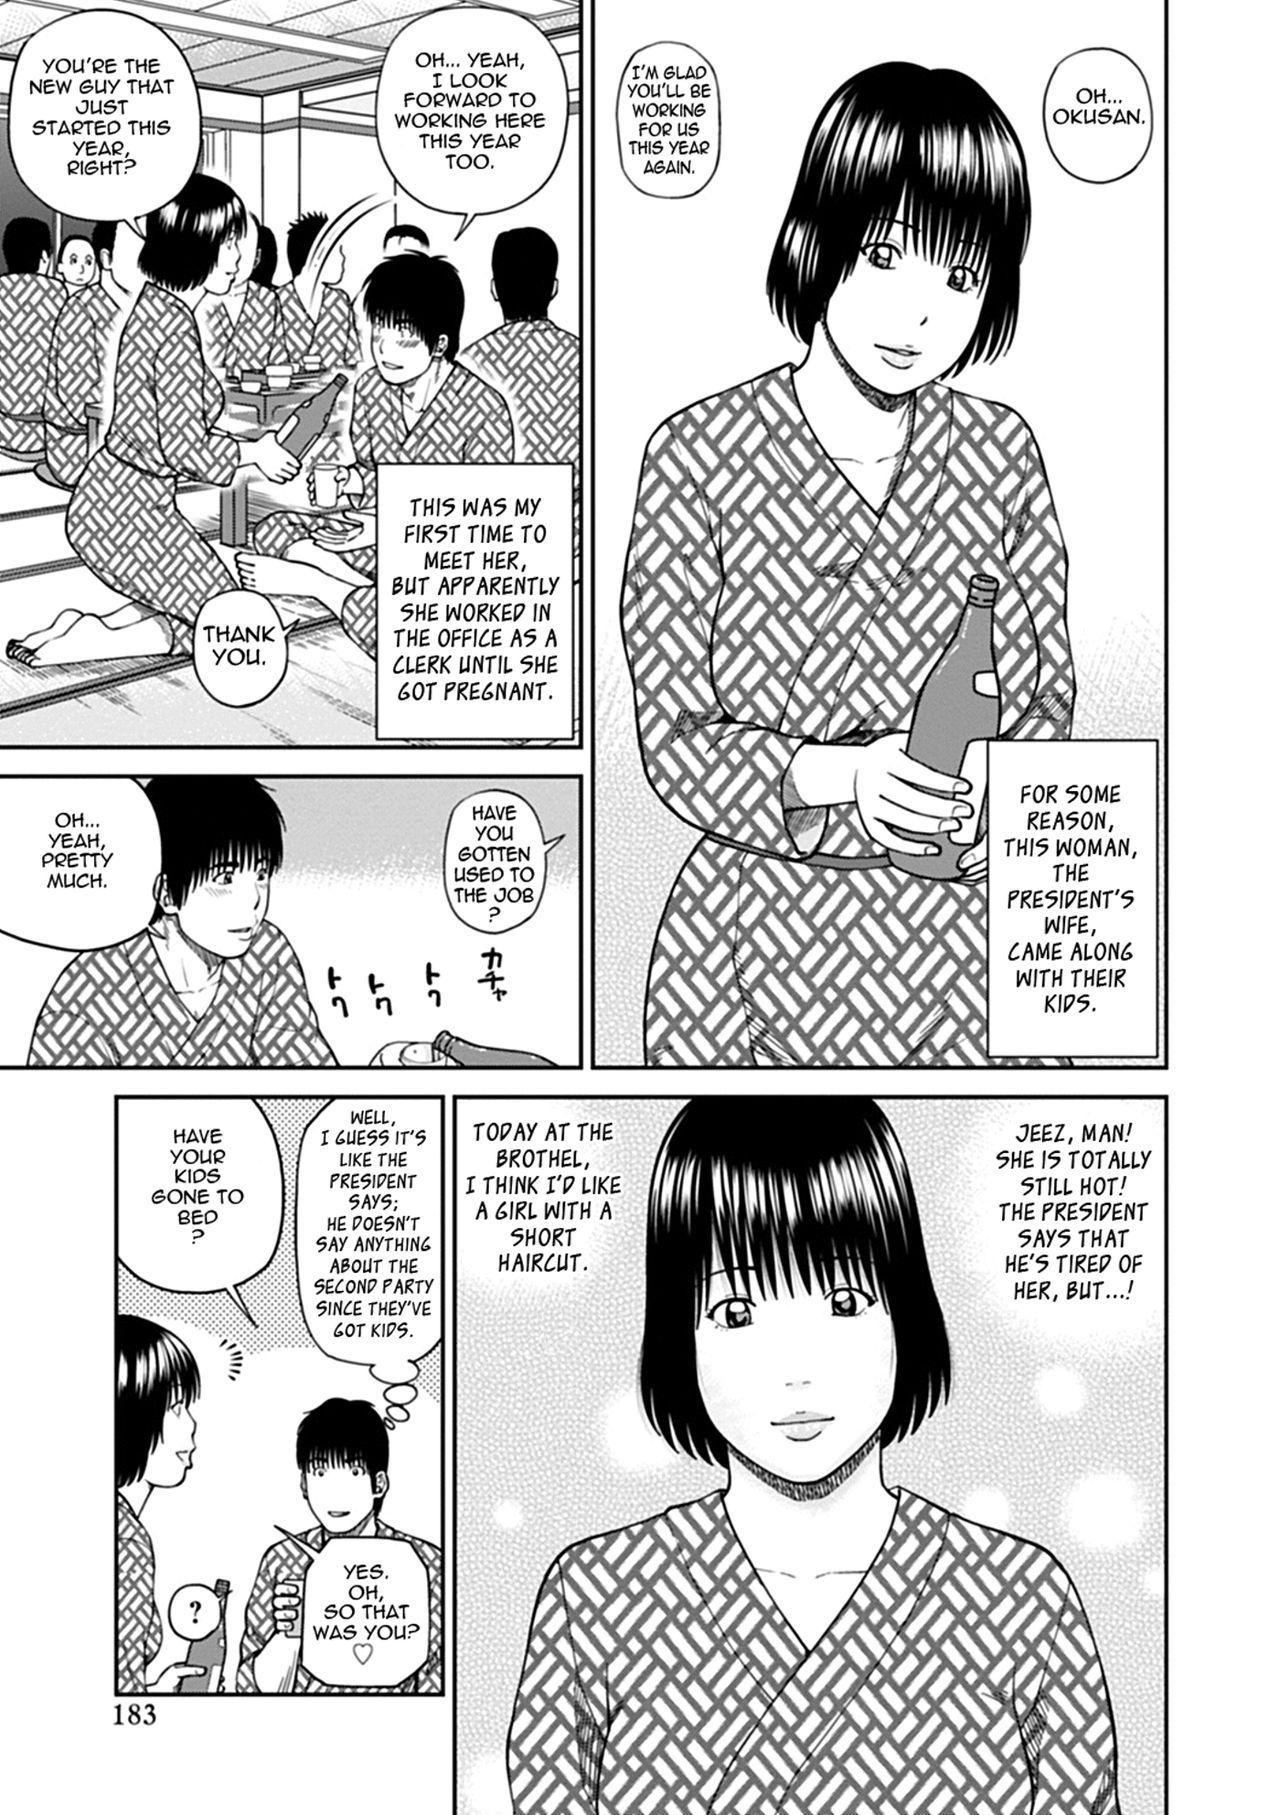 [Kuroki Hidehiko] 36-sai Injuku Sakarizuma | 36-Year-Old Randy Mature Wife [English] {Tadanohito} [Digital] [Uncensored] 175